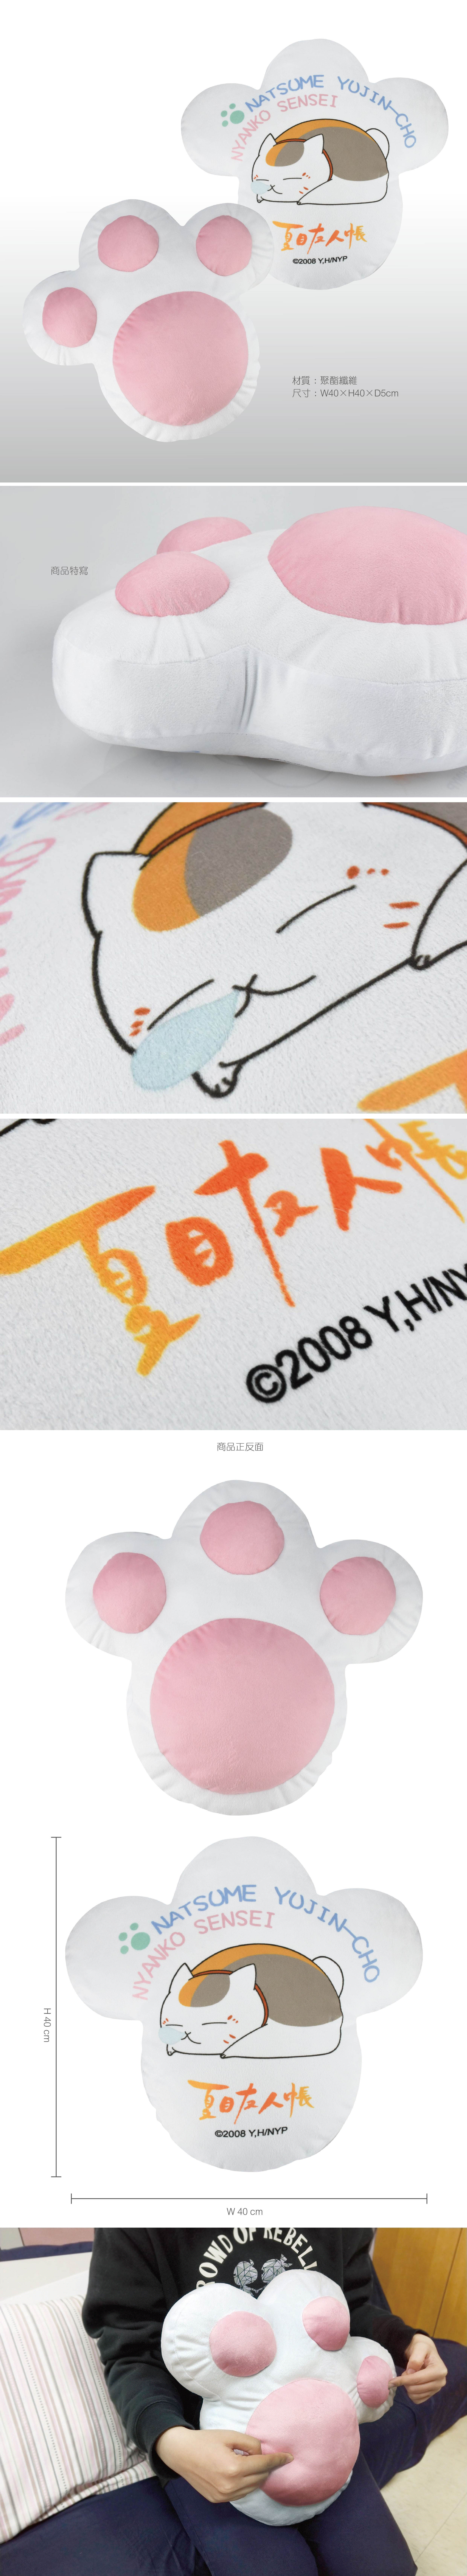 http://products.fukang.com.tw/4712926844472.jpg